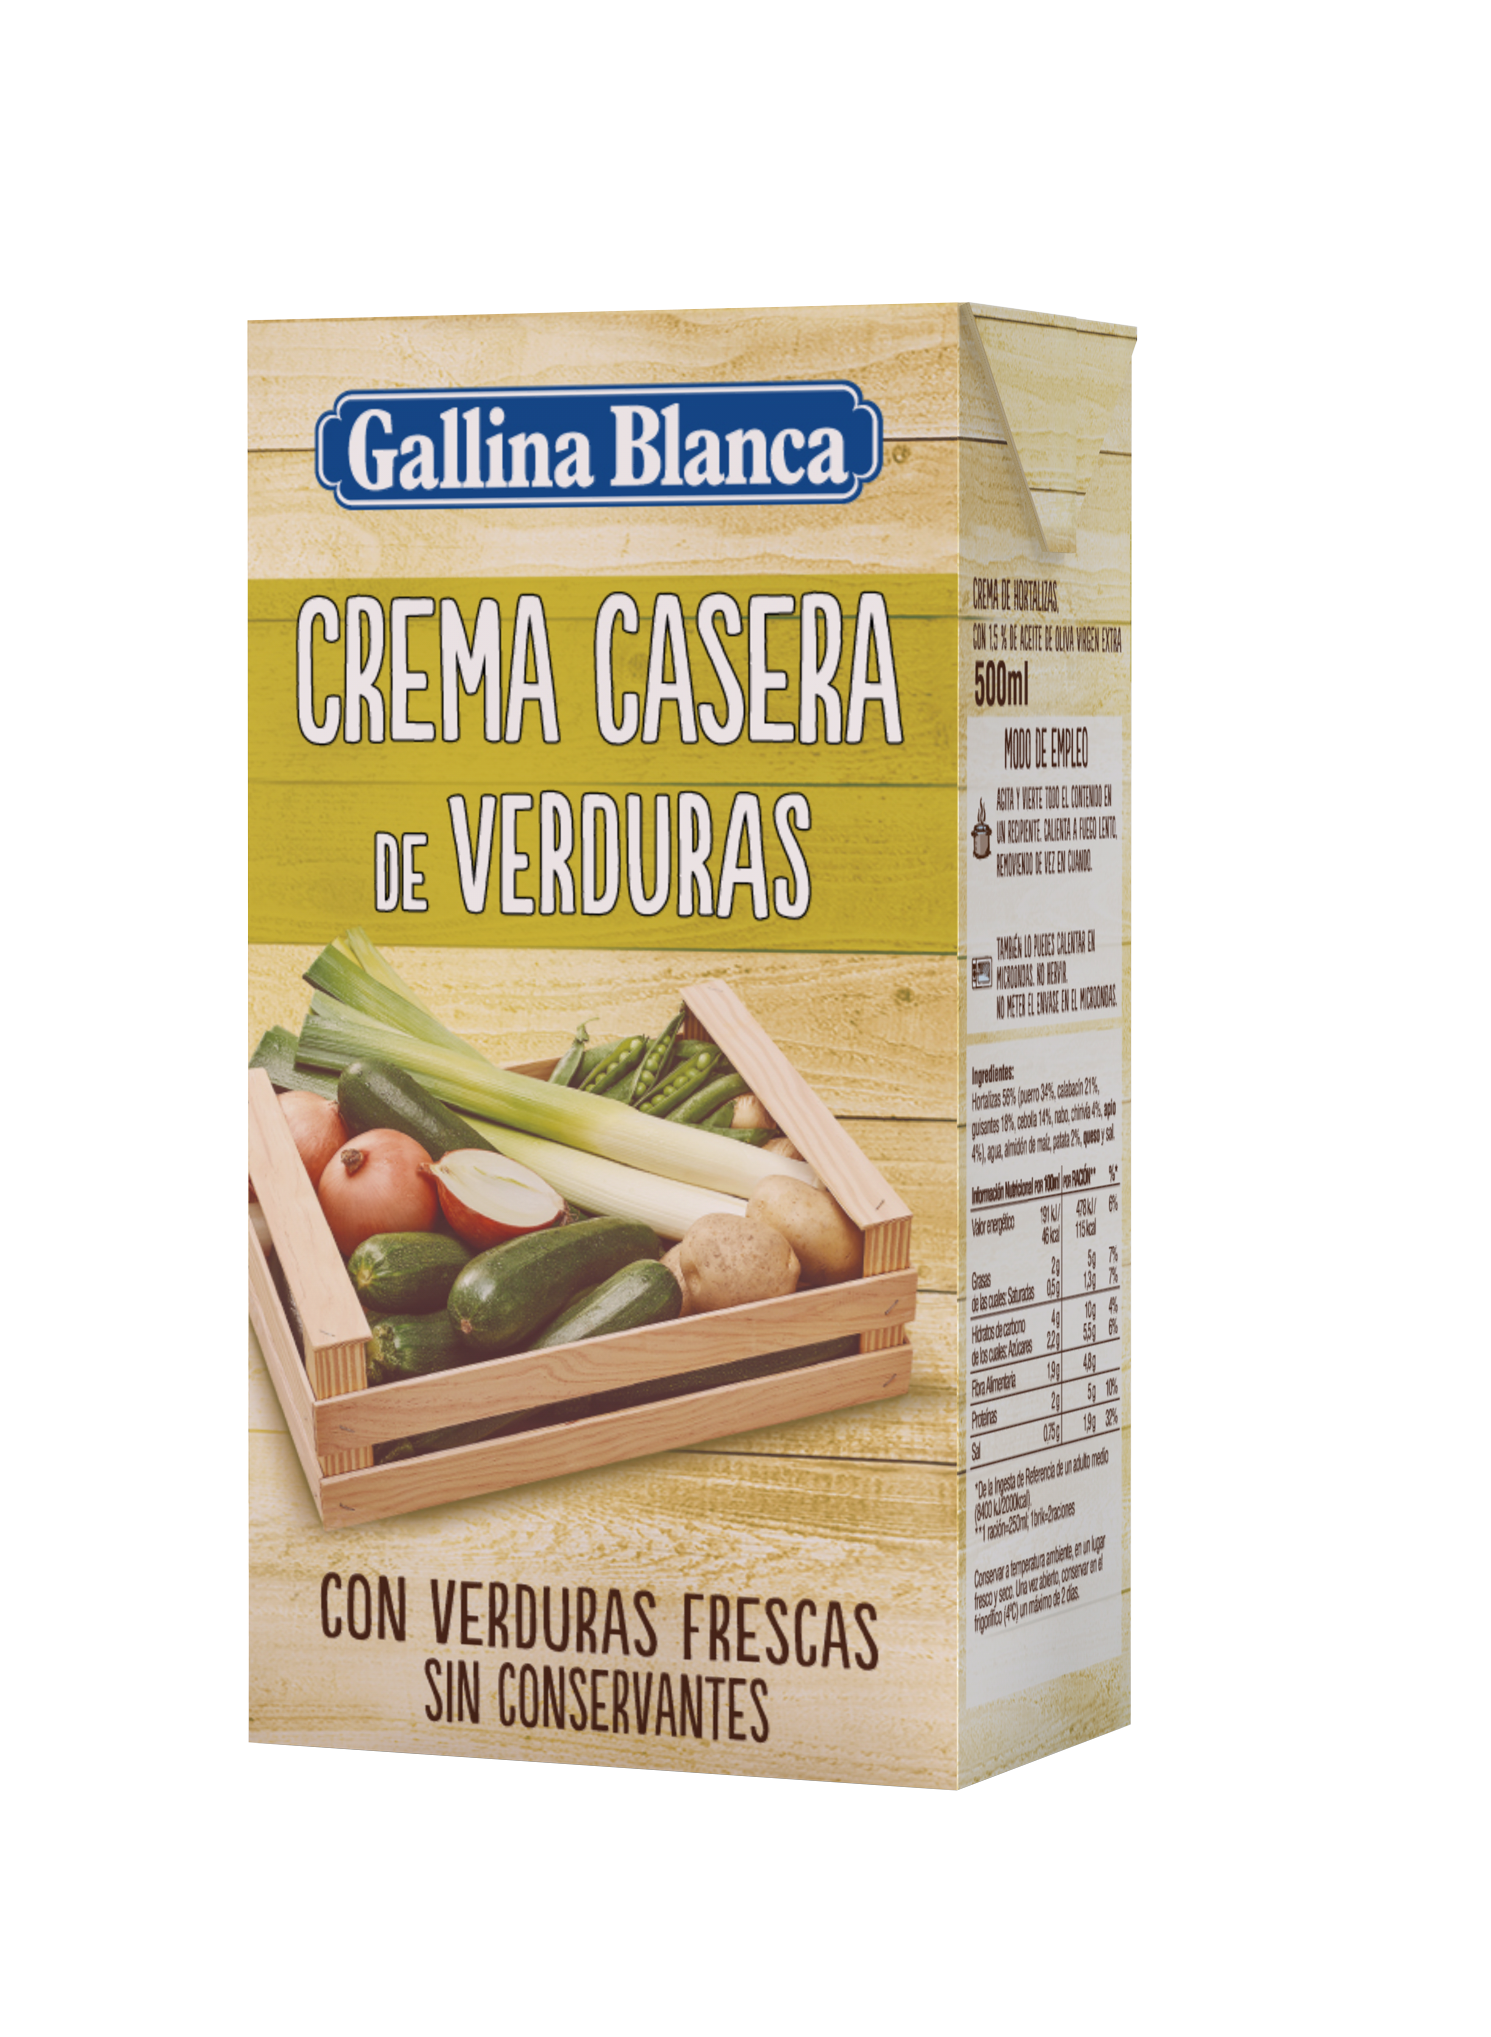 Crema Casera de Verduras